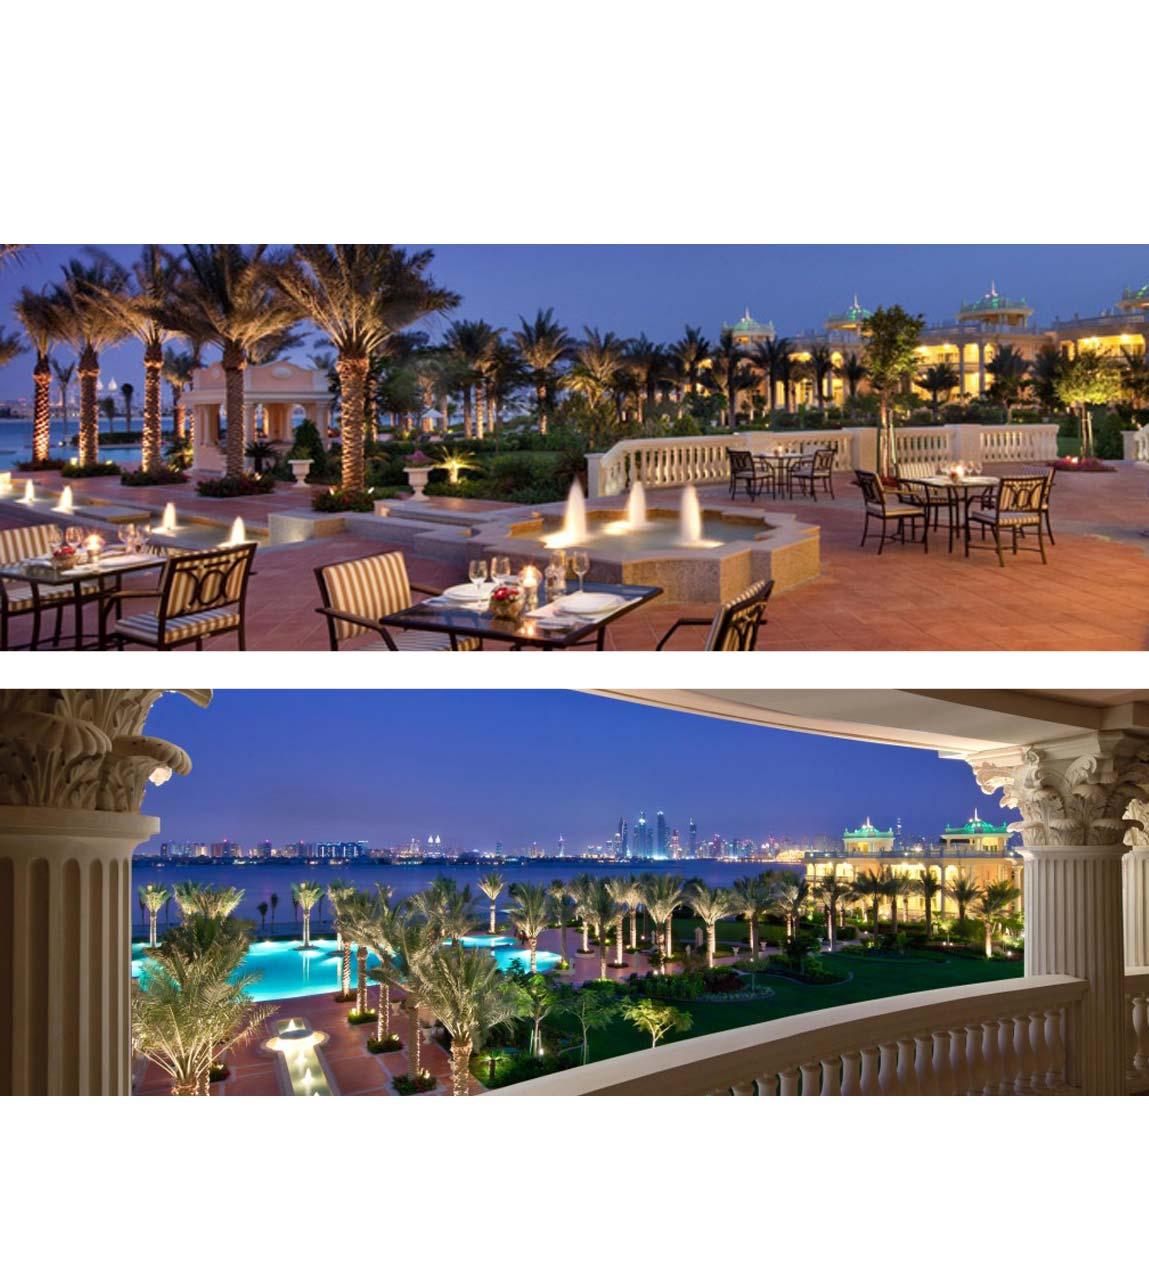 Royal Oaks Apartments Palm Desert: KEMPINSKI HOTEL AND RESIDENCES THE PALM